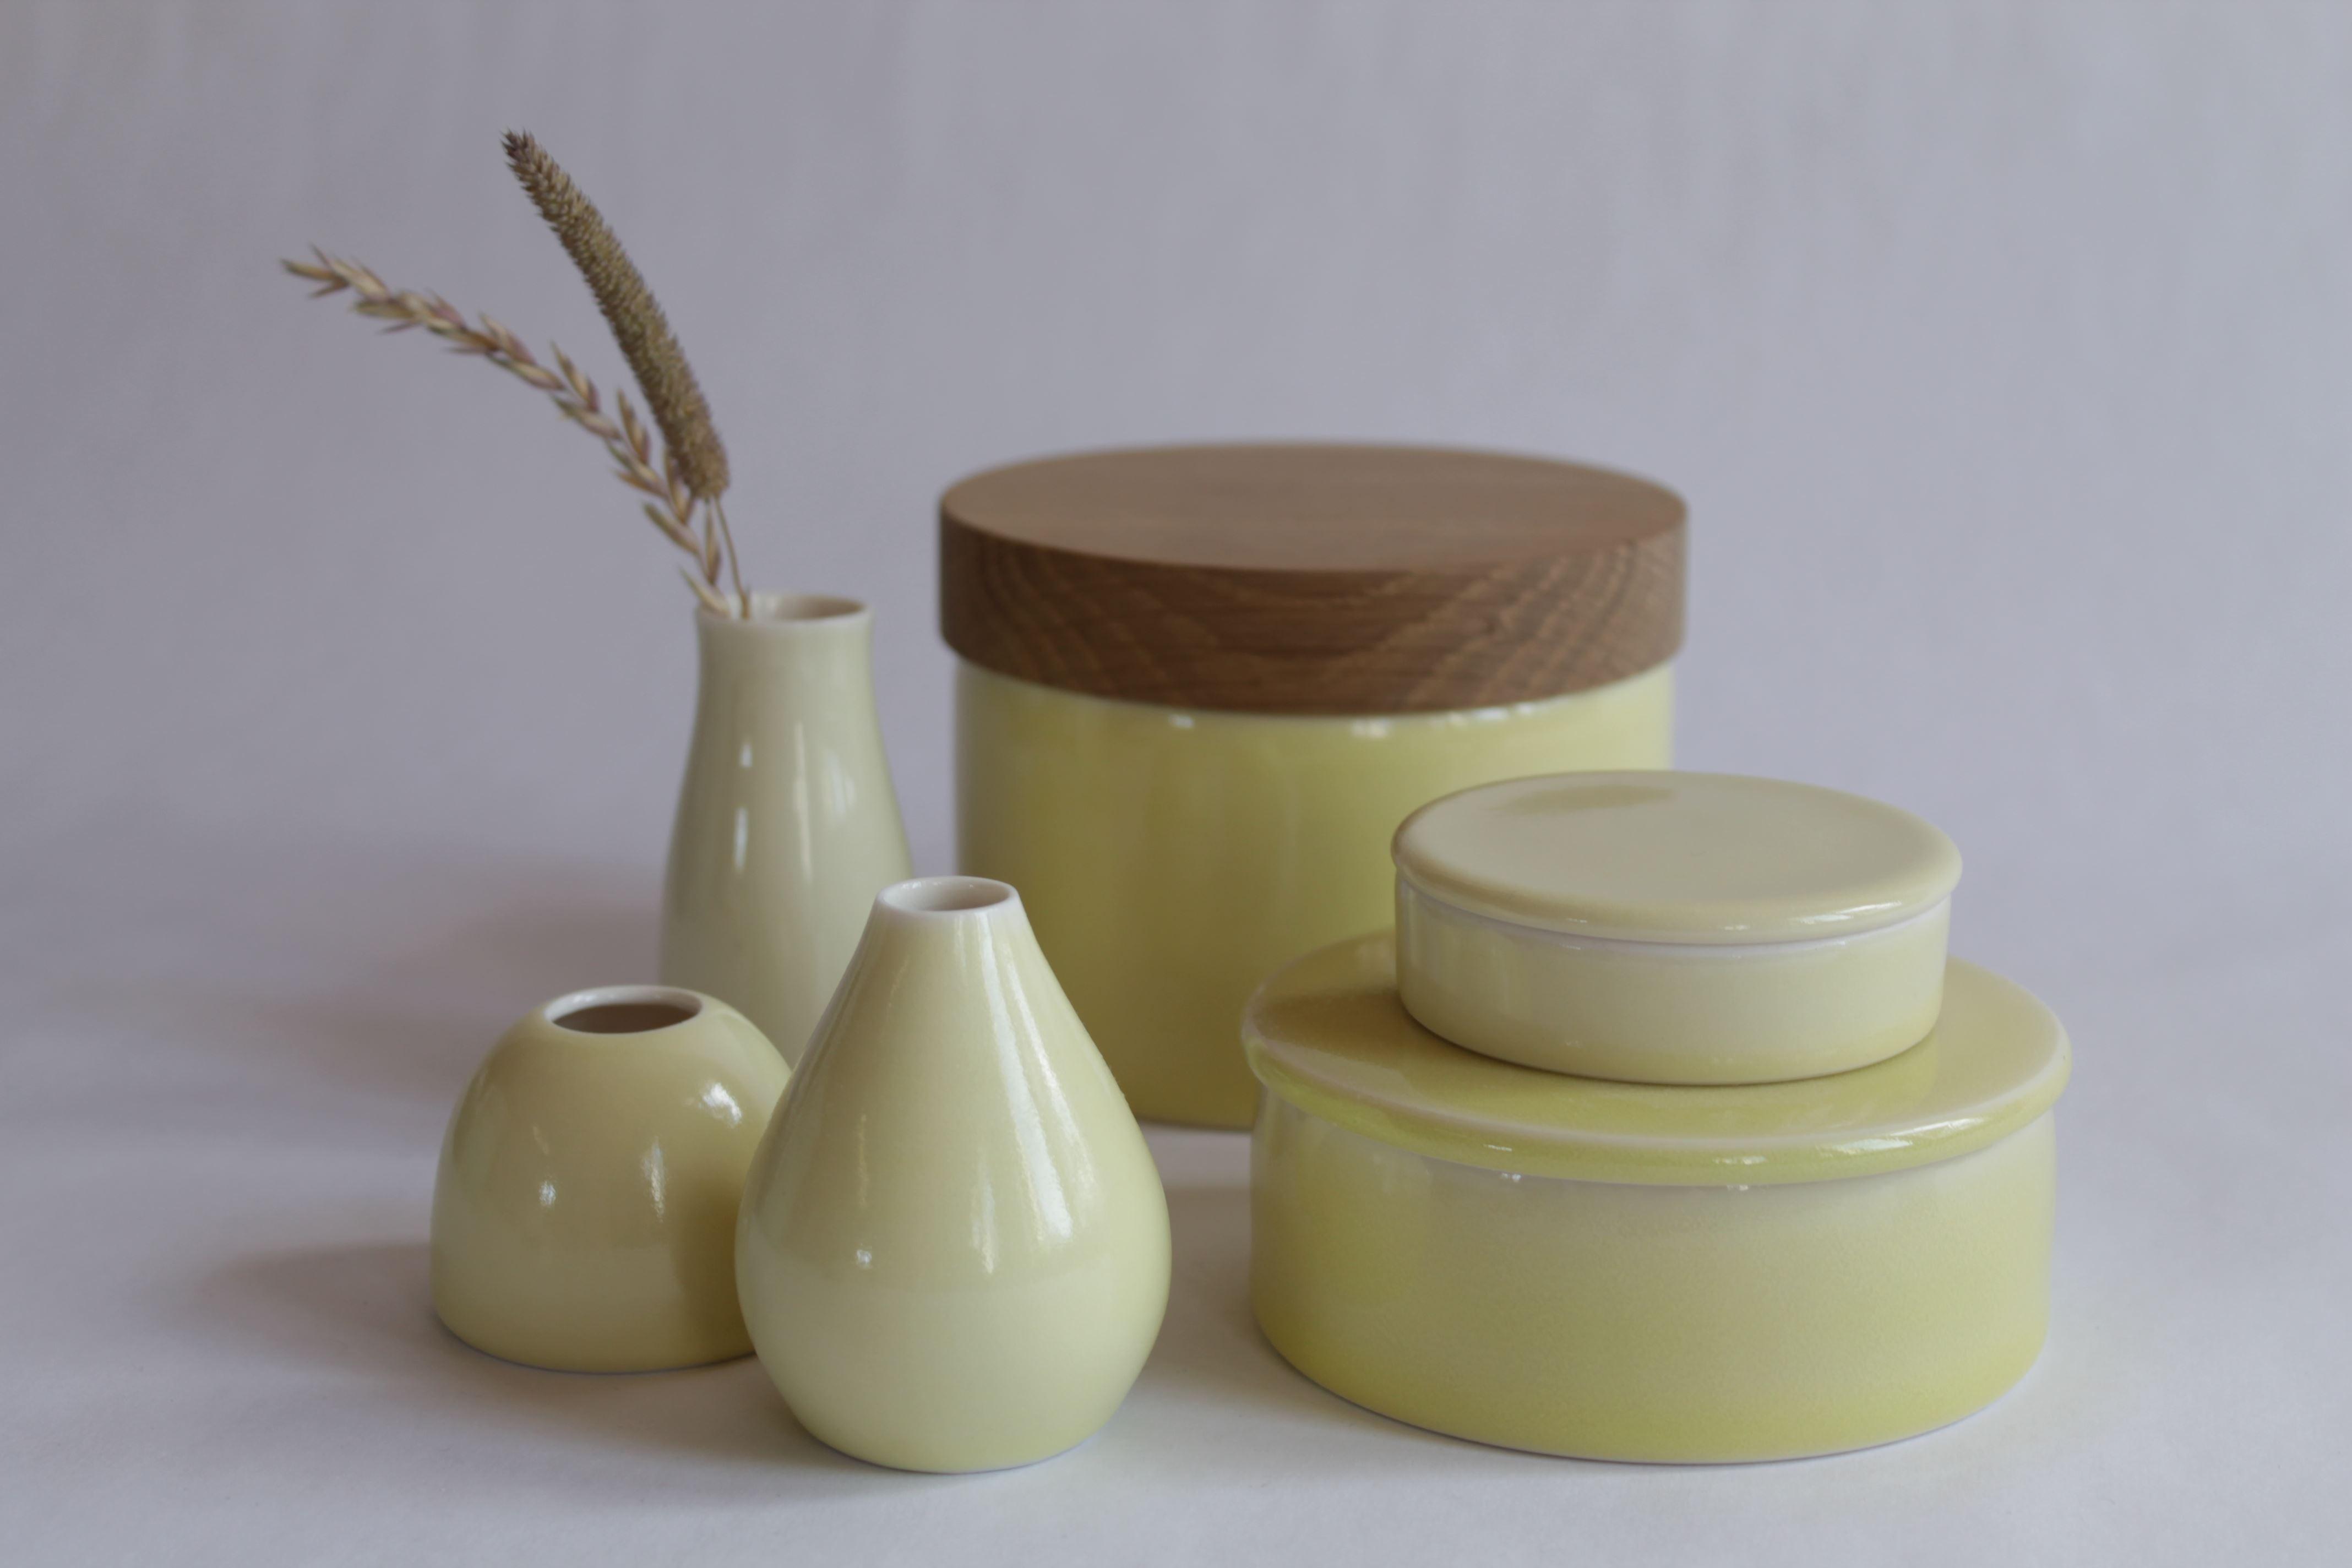 Humlebäck keramik & möbelsnickeri